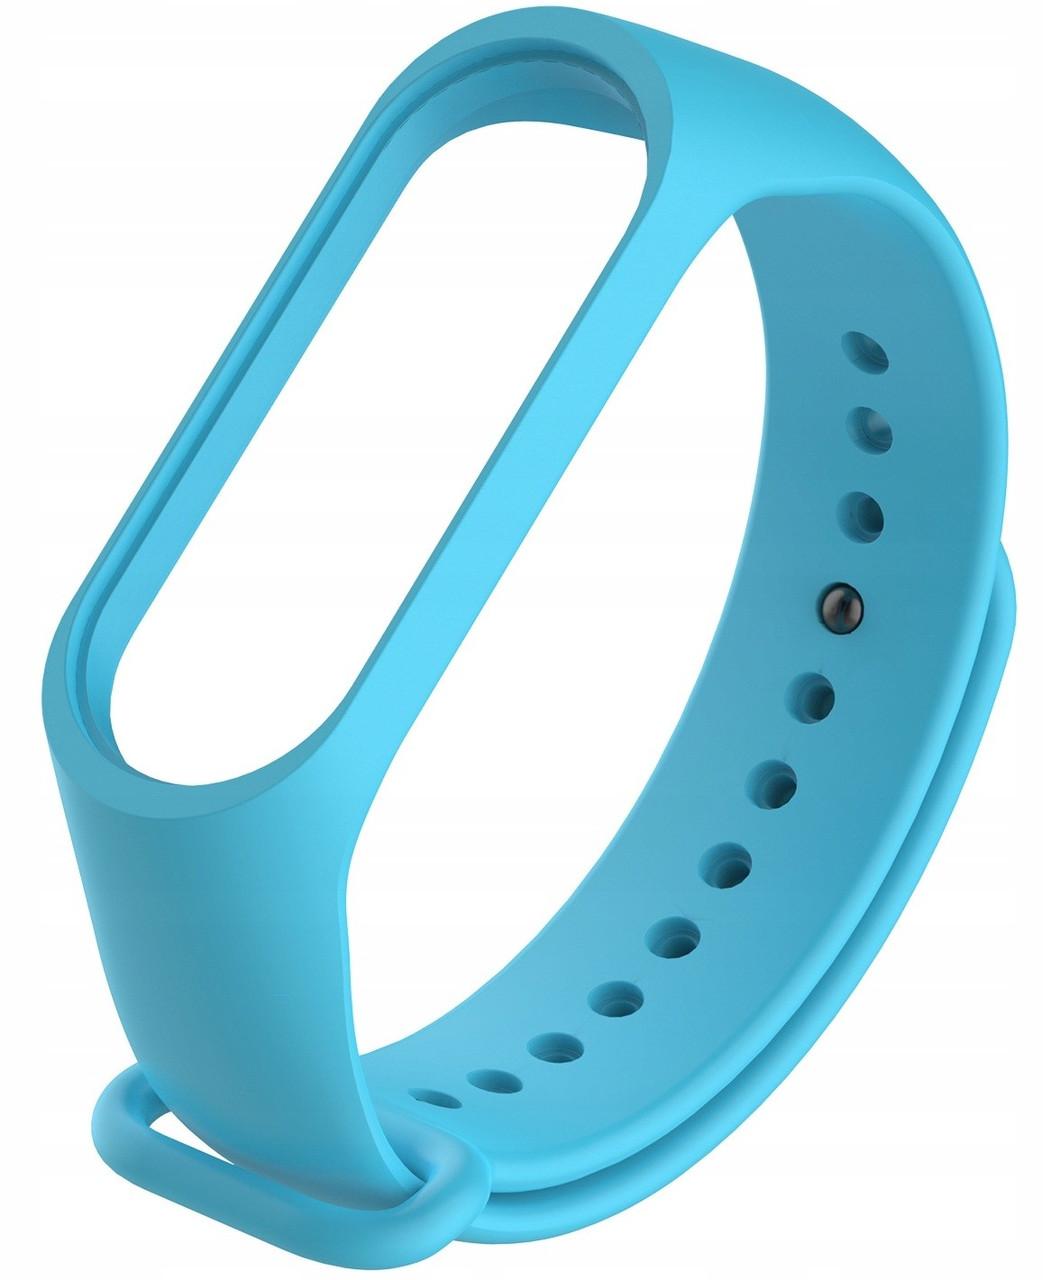 Ремешок NZY для Xiaomi Mi Band 3 Голубой (ARM51832)